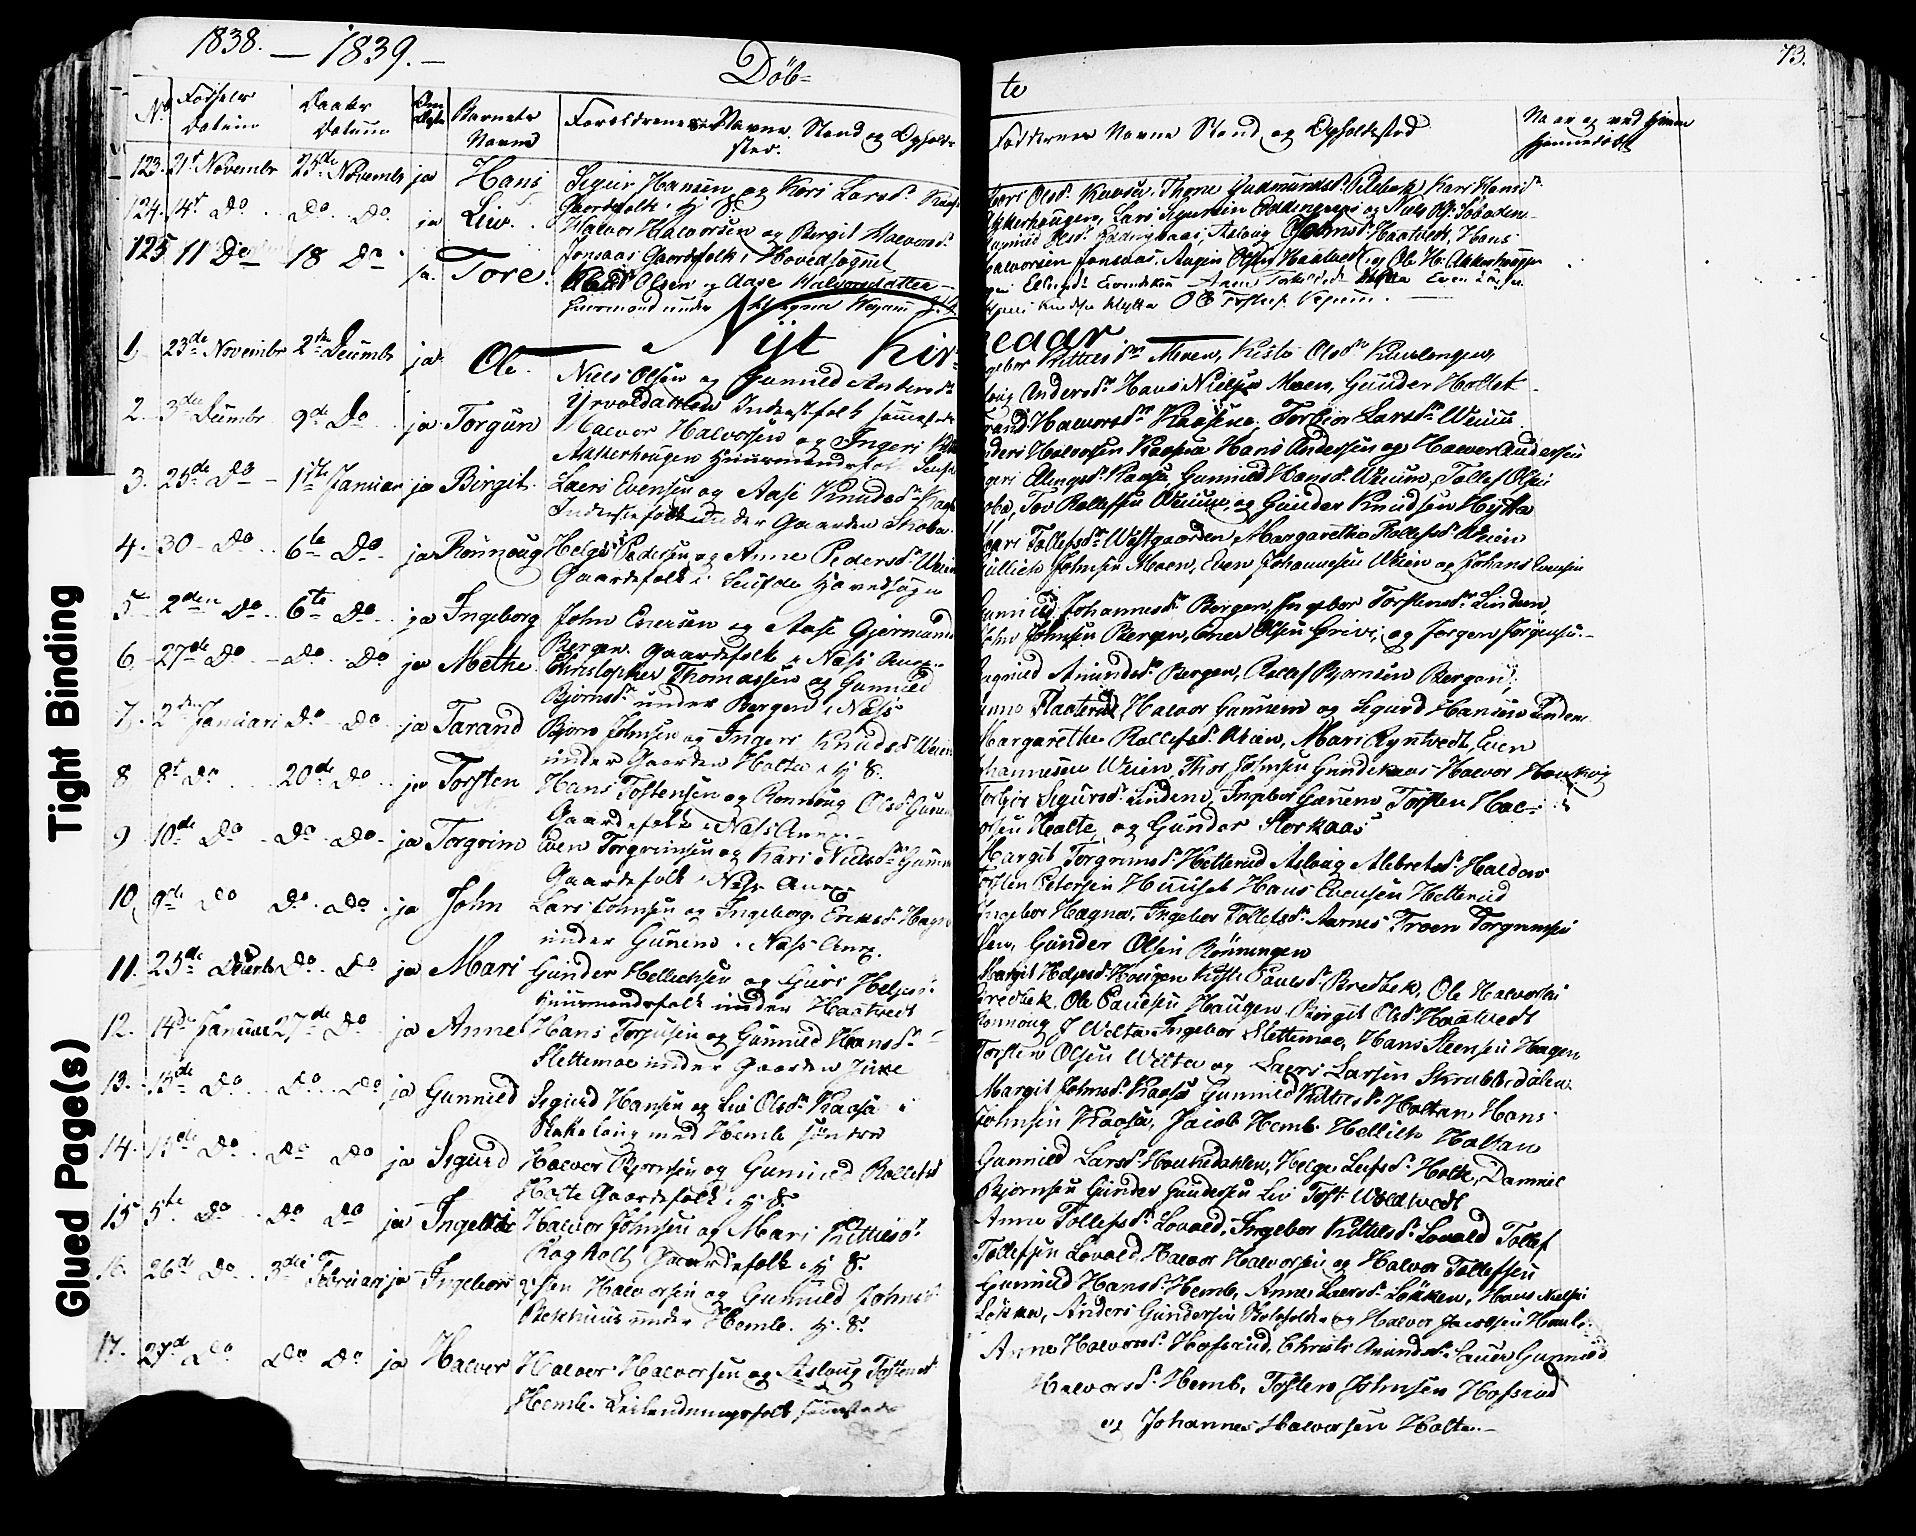 SAKO, Sauherad kirkebøker, F/Fa/L0006: Ministerialbok nr. I 6, 1827-1850, s. 73